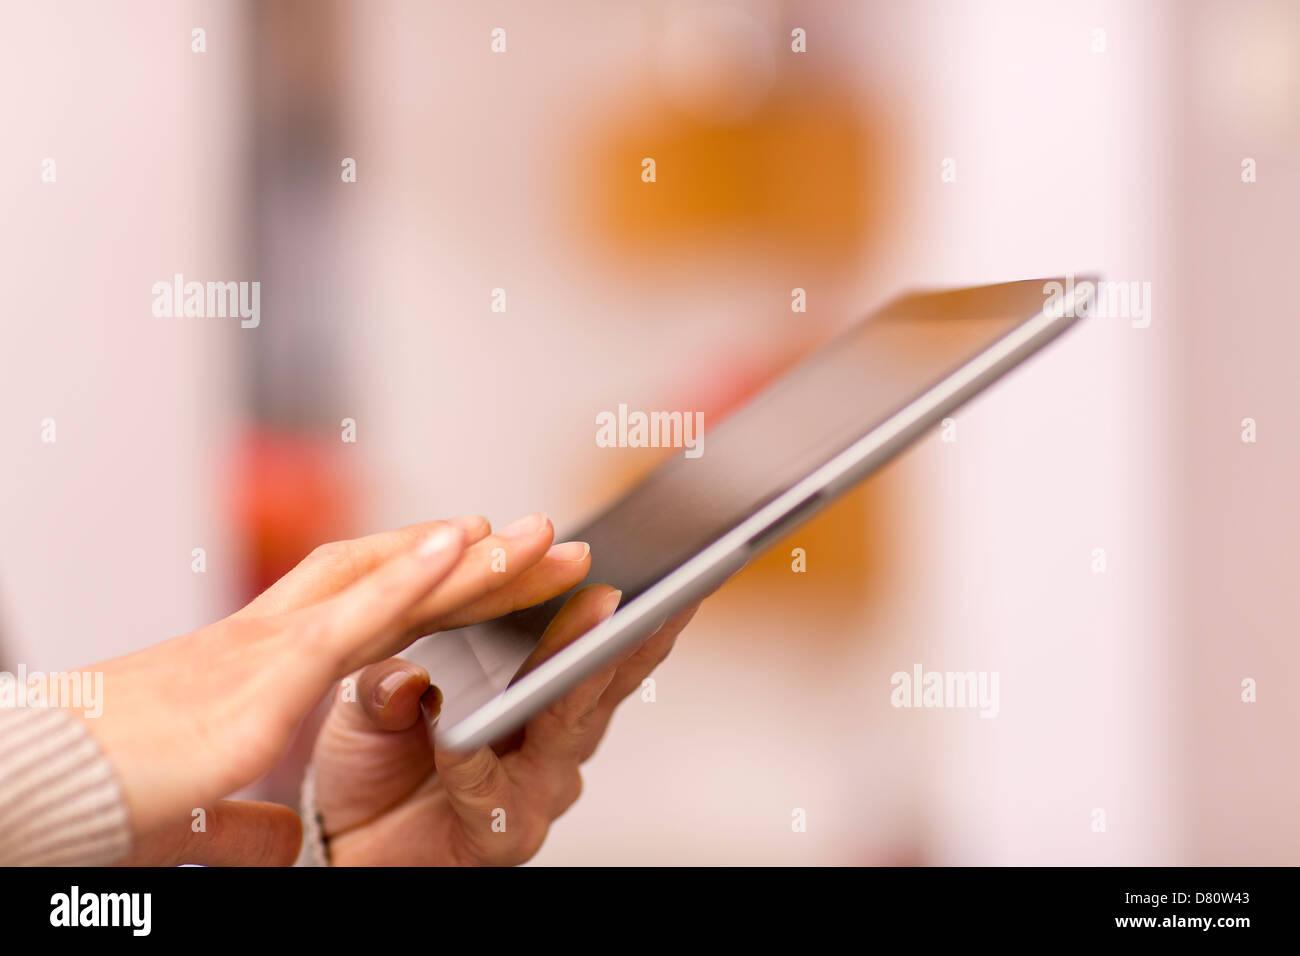 Frau mit digital-Tablette, Nahaufnahme Stockbild